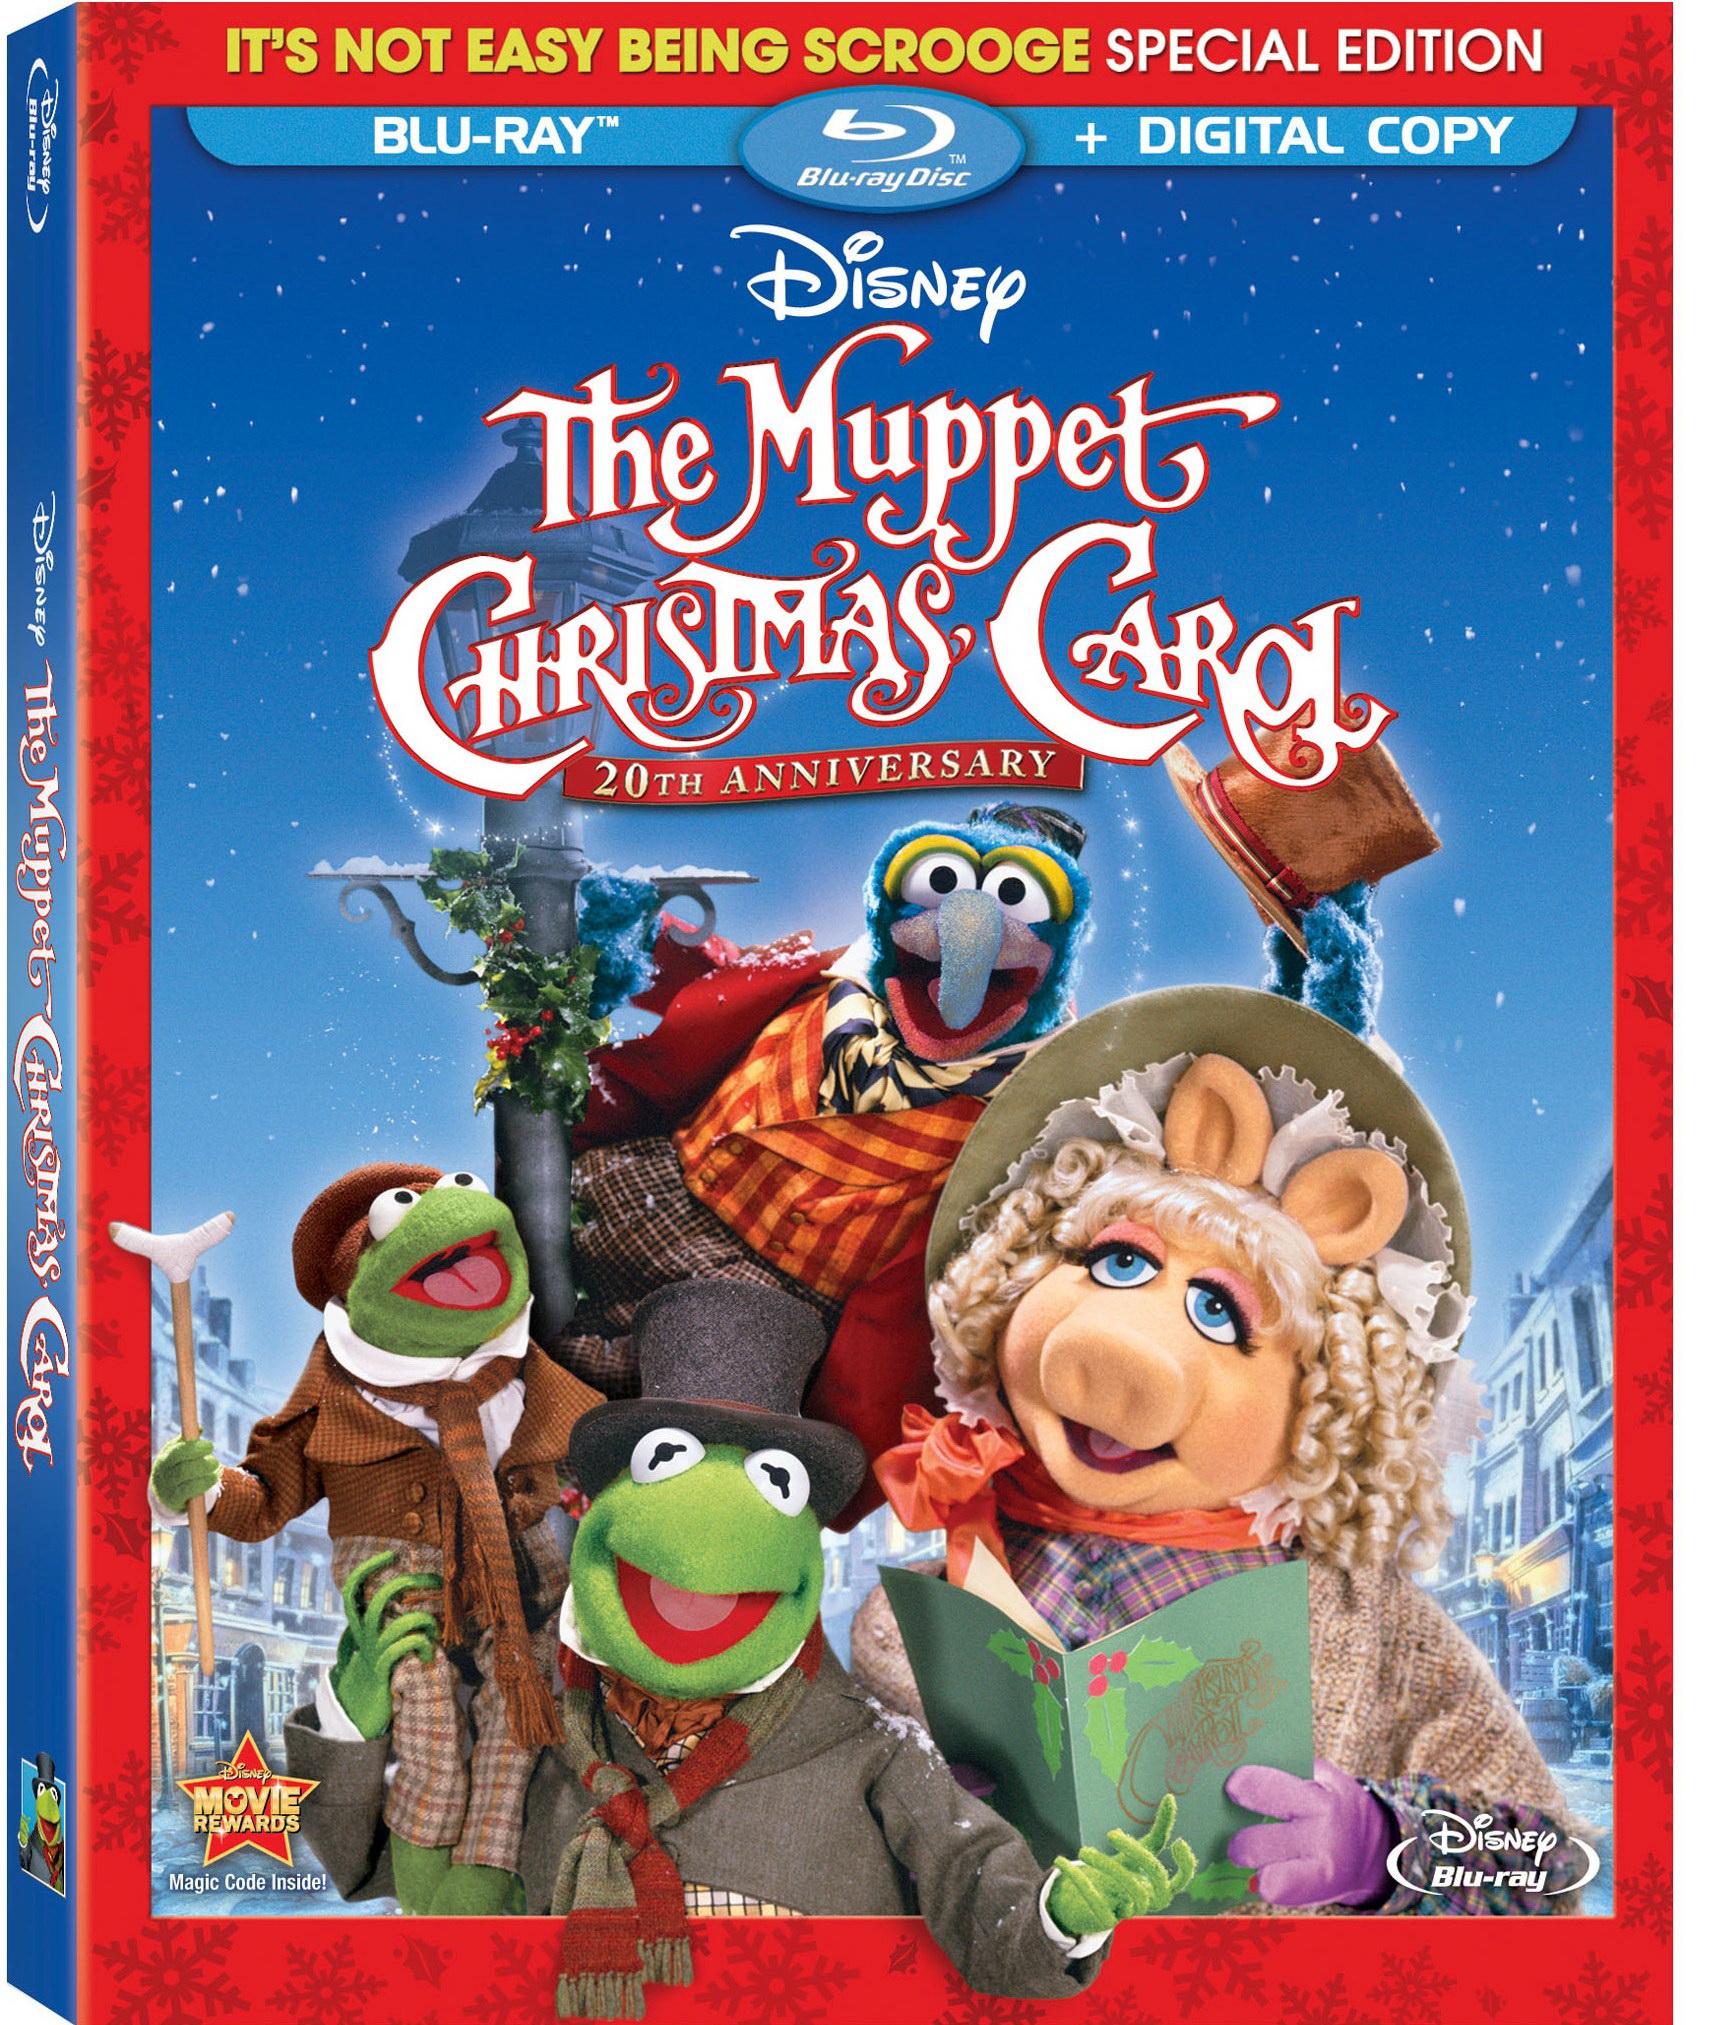 A Muppet Christmas Carol Movie Night: The Muppet Christmas Carol (video)